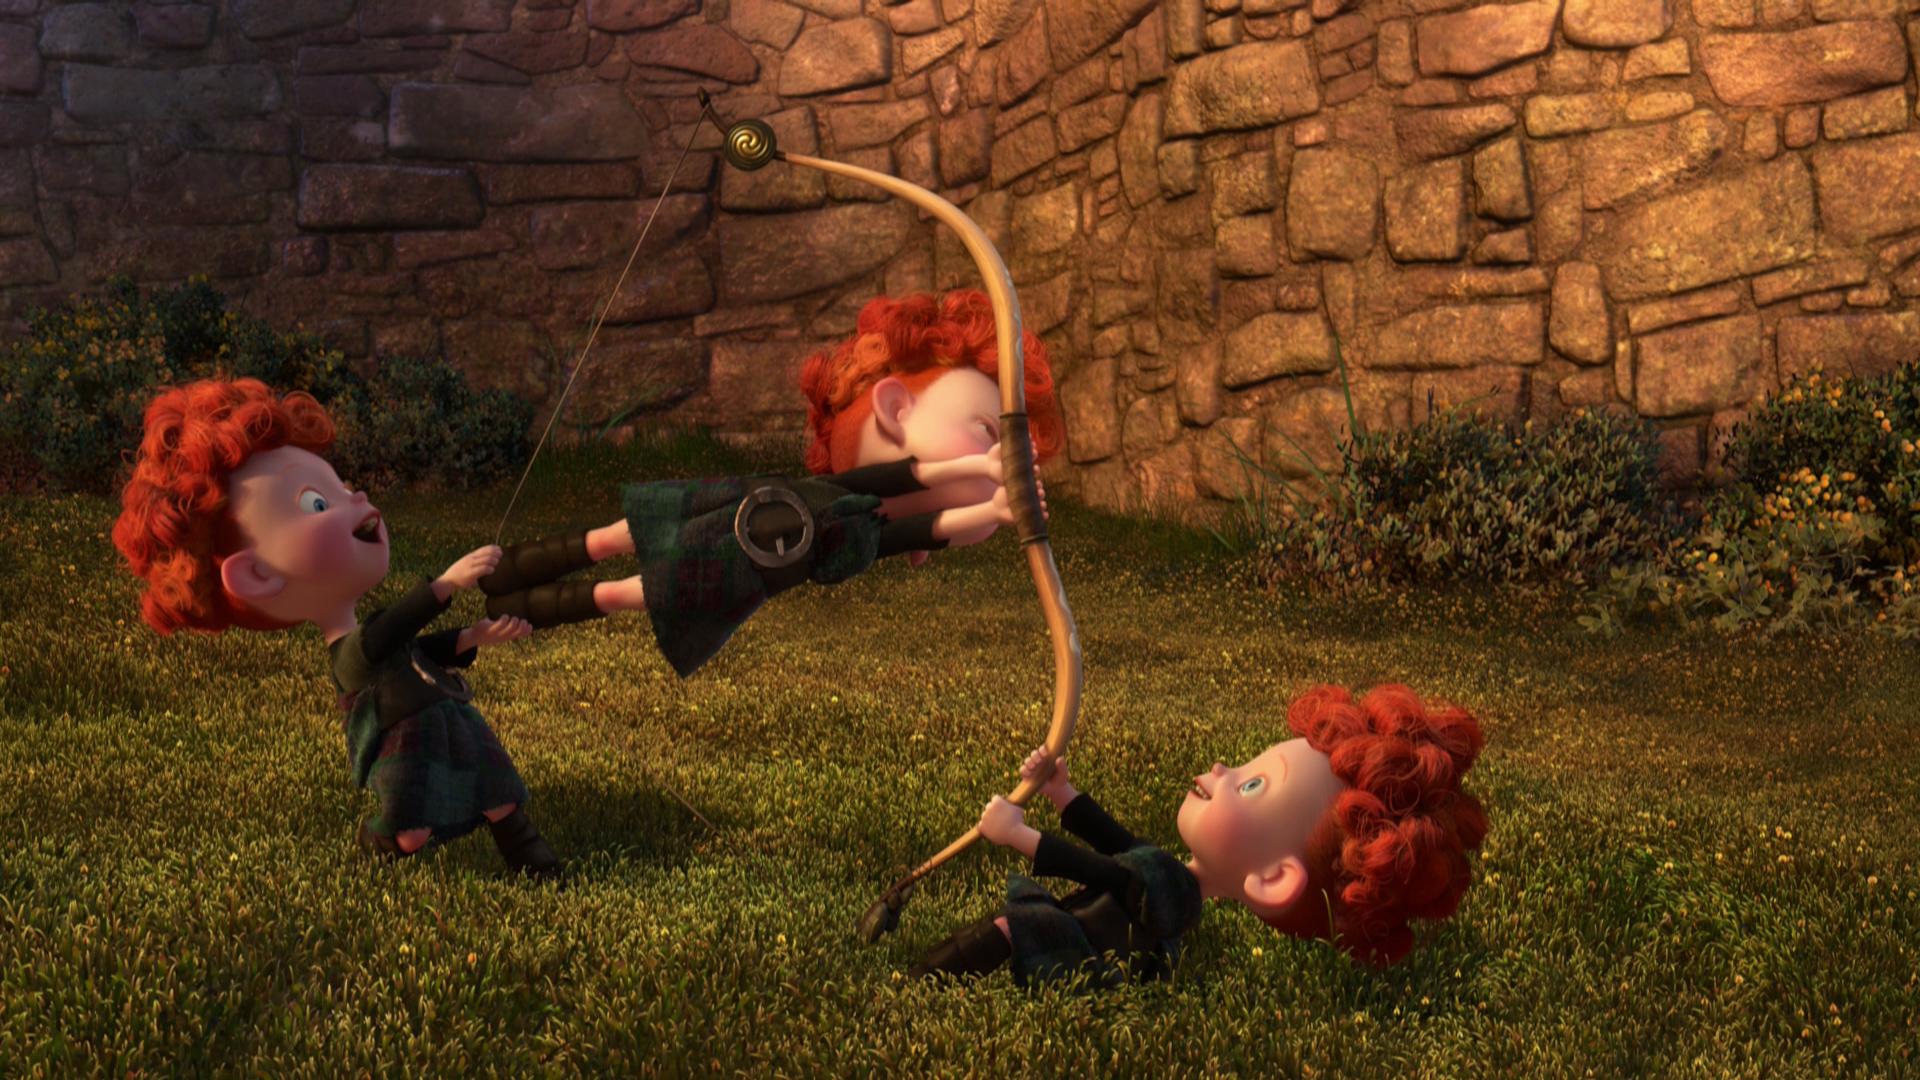 image - brave extra scene 14 | pixar wiki | fandom poweredwikia